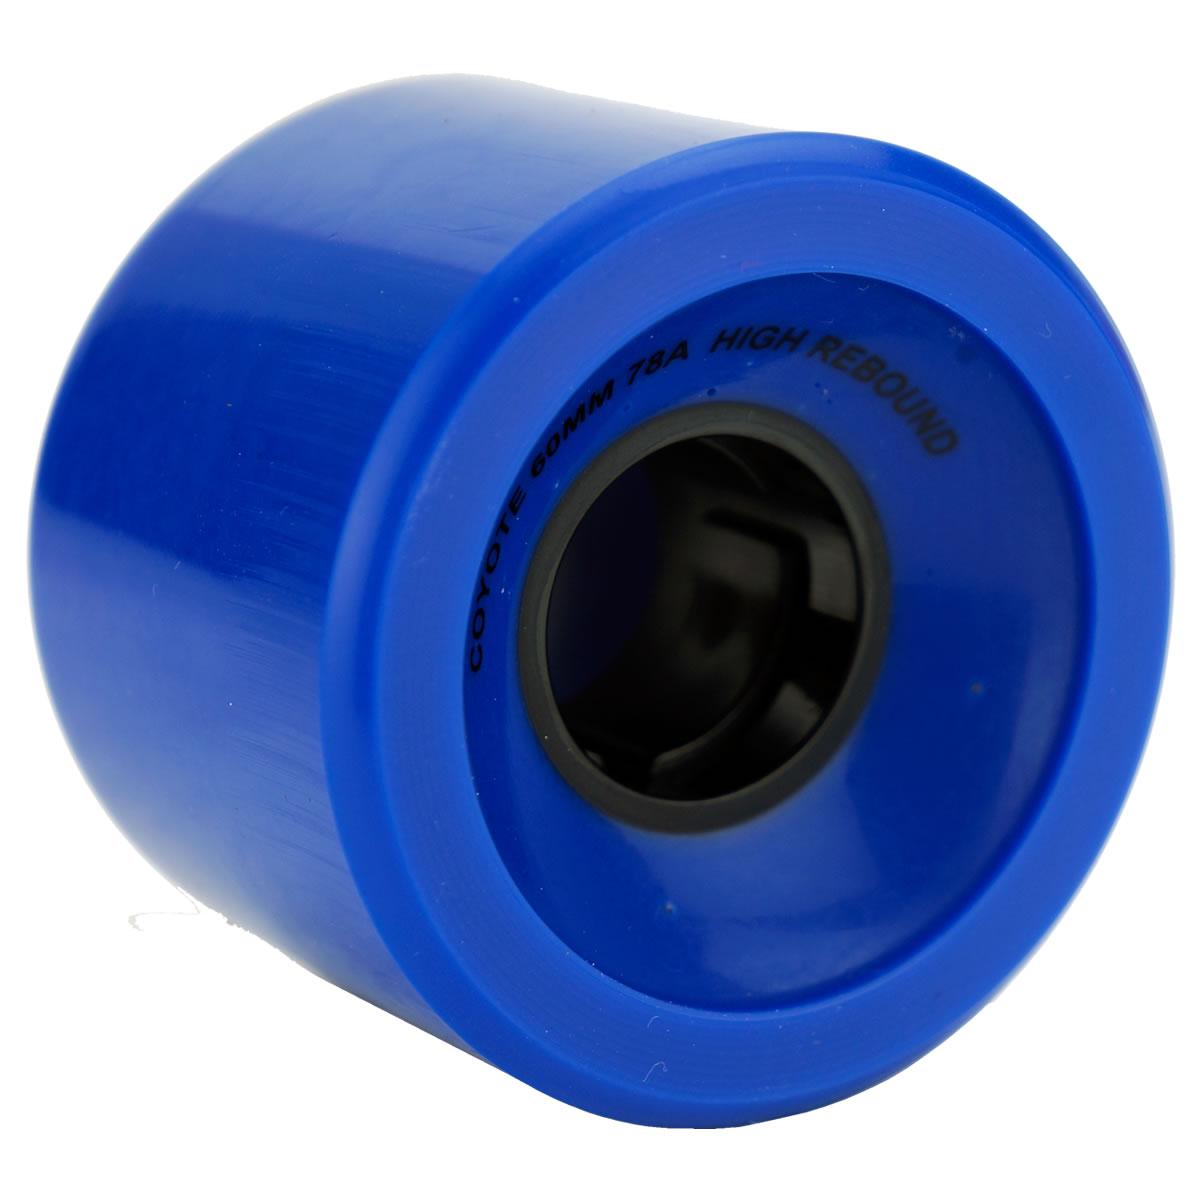 Coyote-Blank-60mm-Blue-Side-Angle.jpg